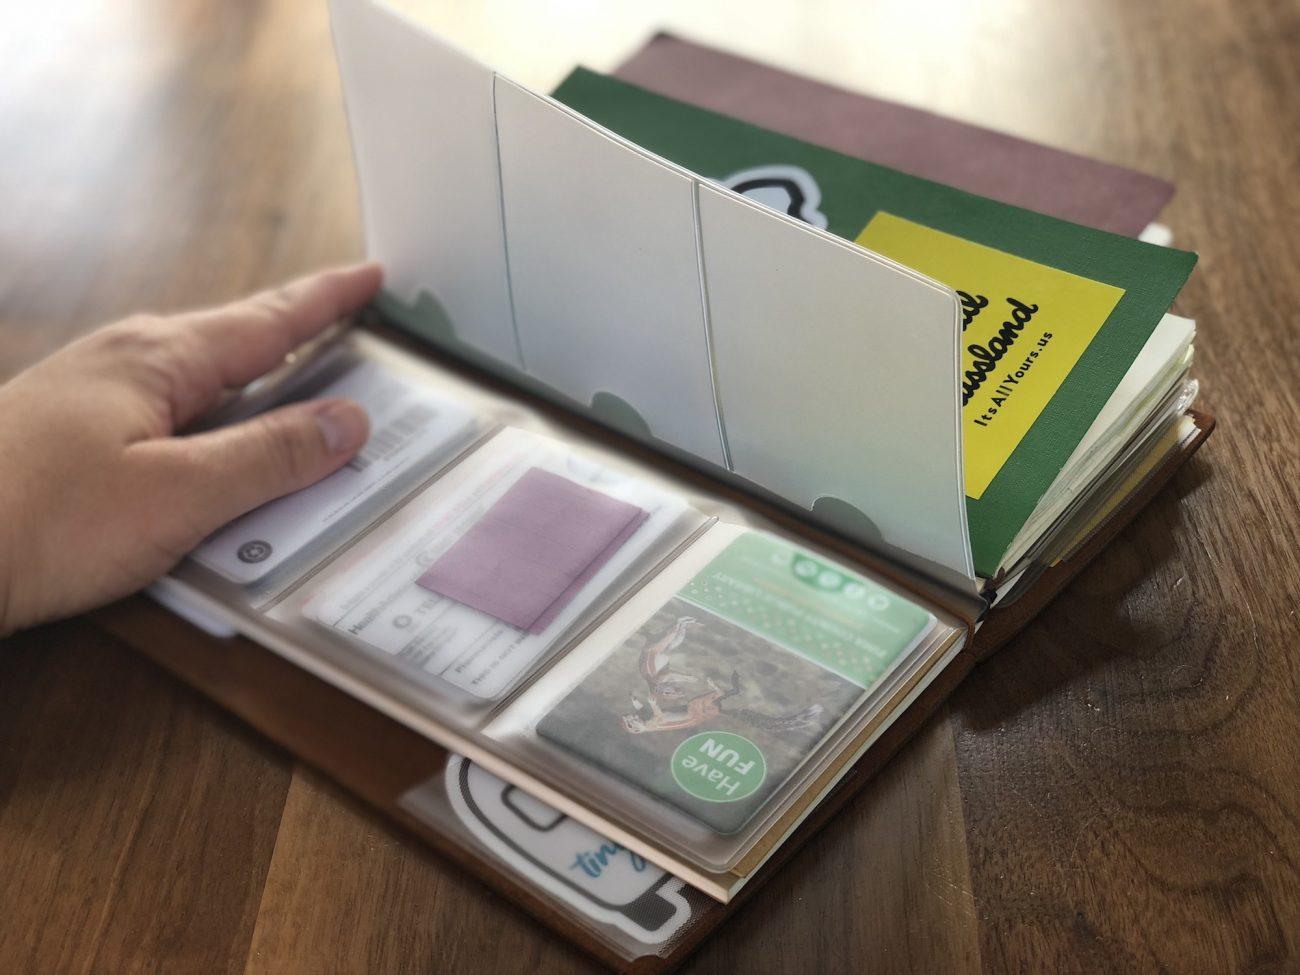 Travelers Notebook - Card holder